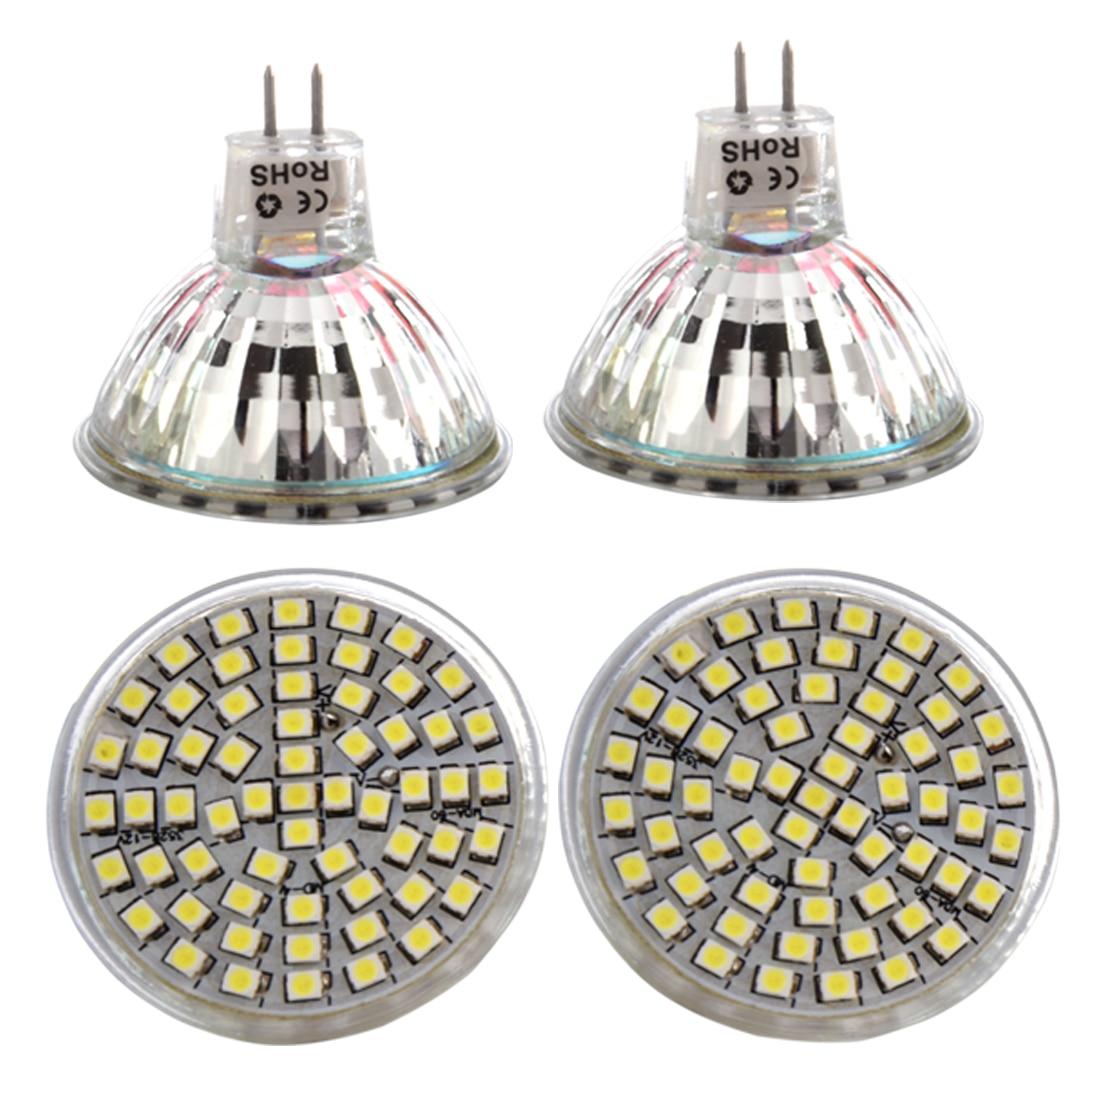 4x MR16 GU5.3 White 60 SMD 3528 LED Energy Saving Spotlight Light Lamp Bulb 12V smart bulb e27 7w led bulb energy saving lamp color changeable smart bulb led lighting for iphone android home bedroom lighitng